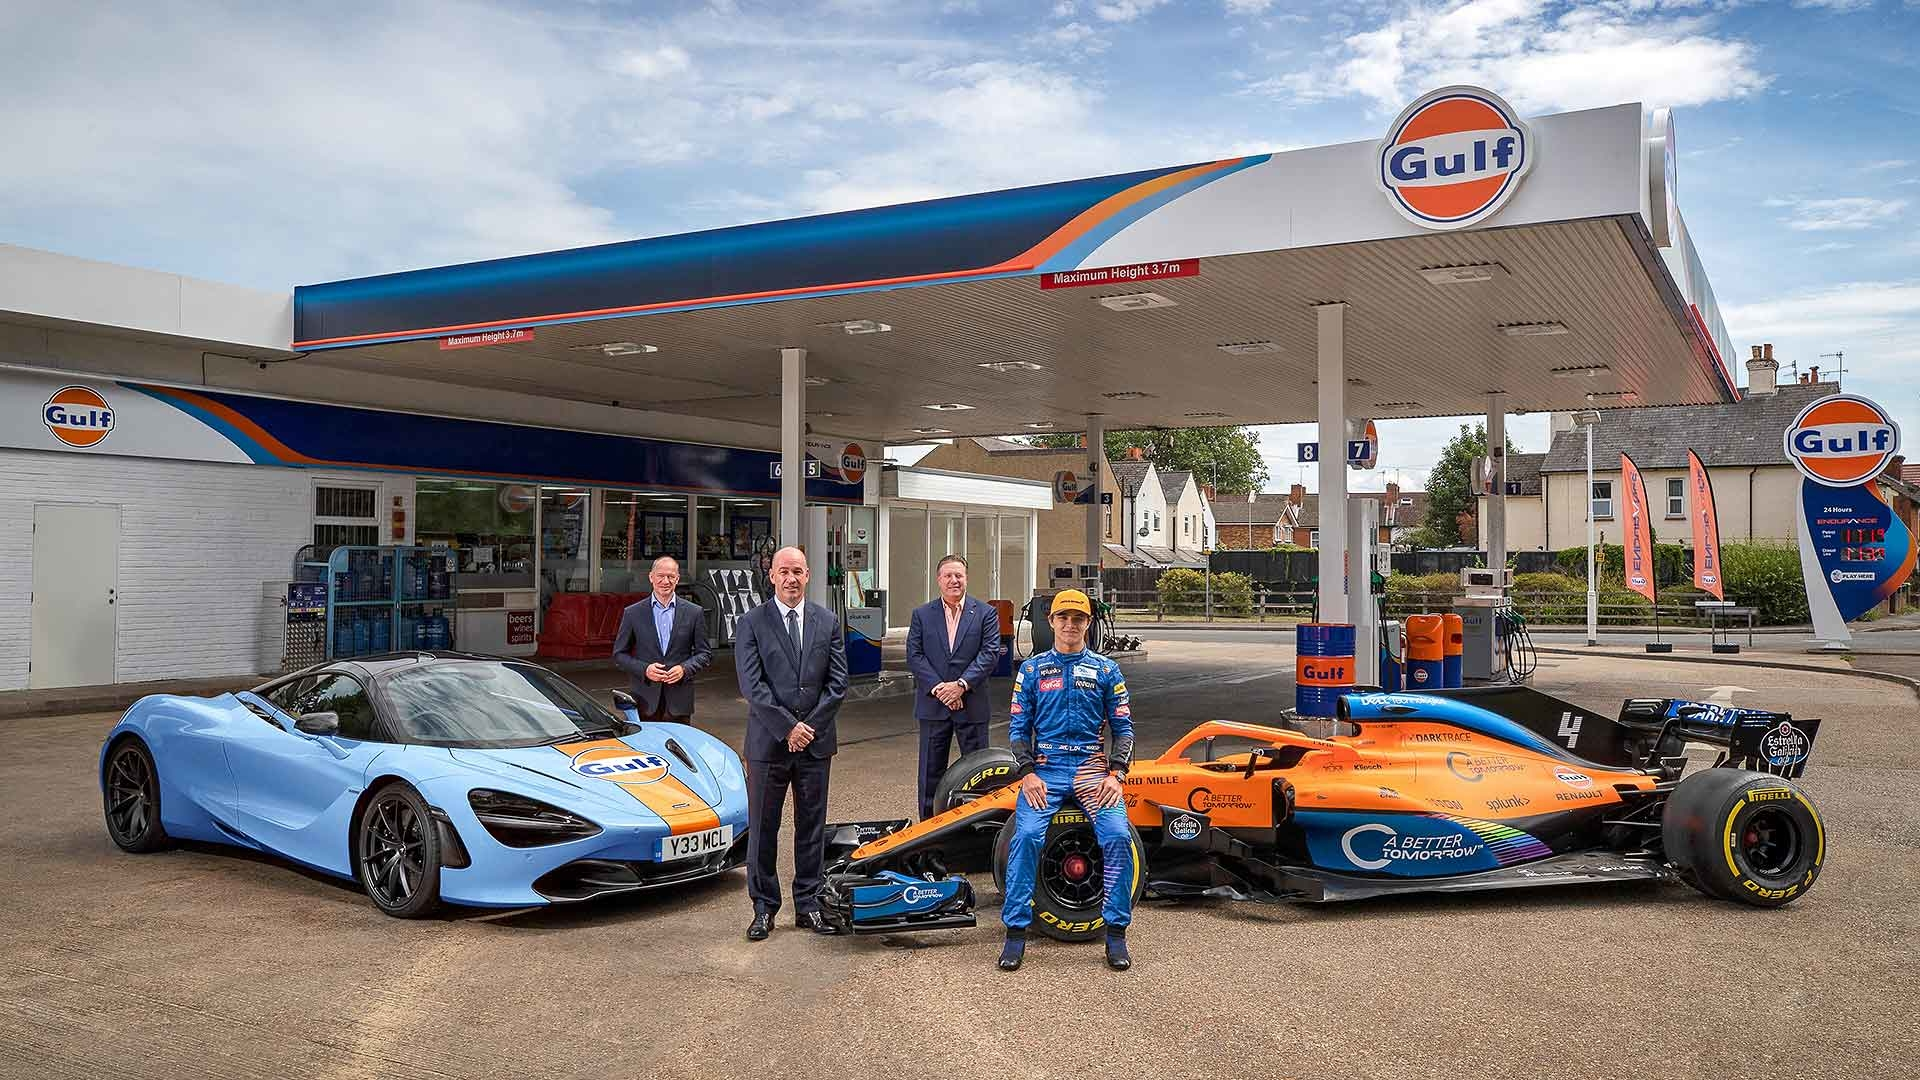 McLaren Automotive and Gulf Oil